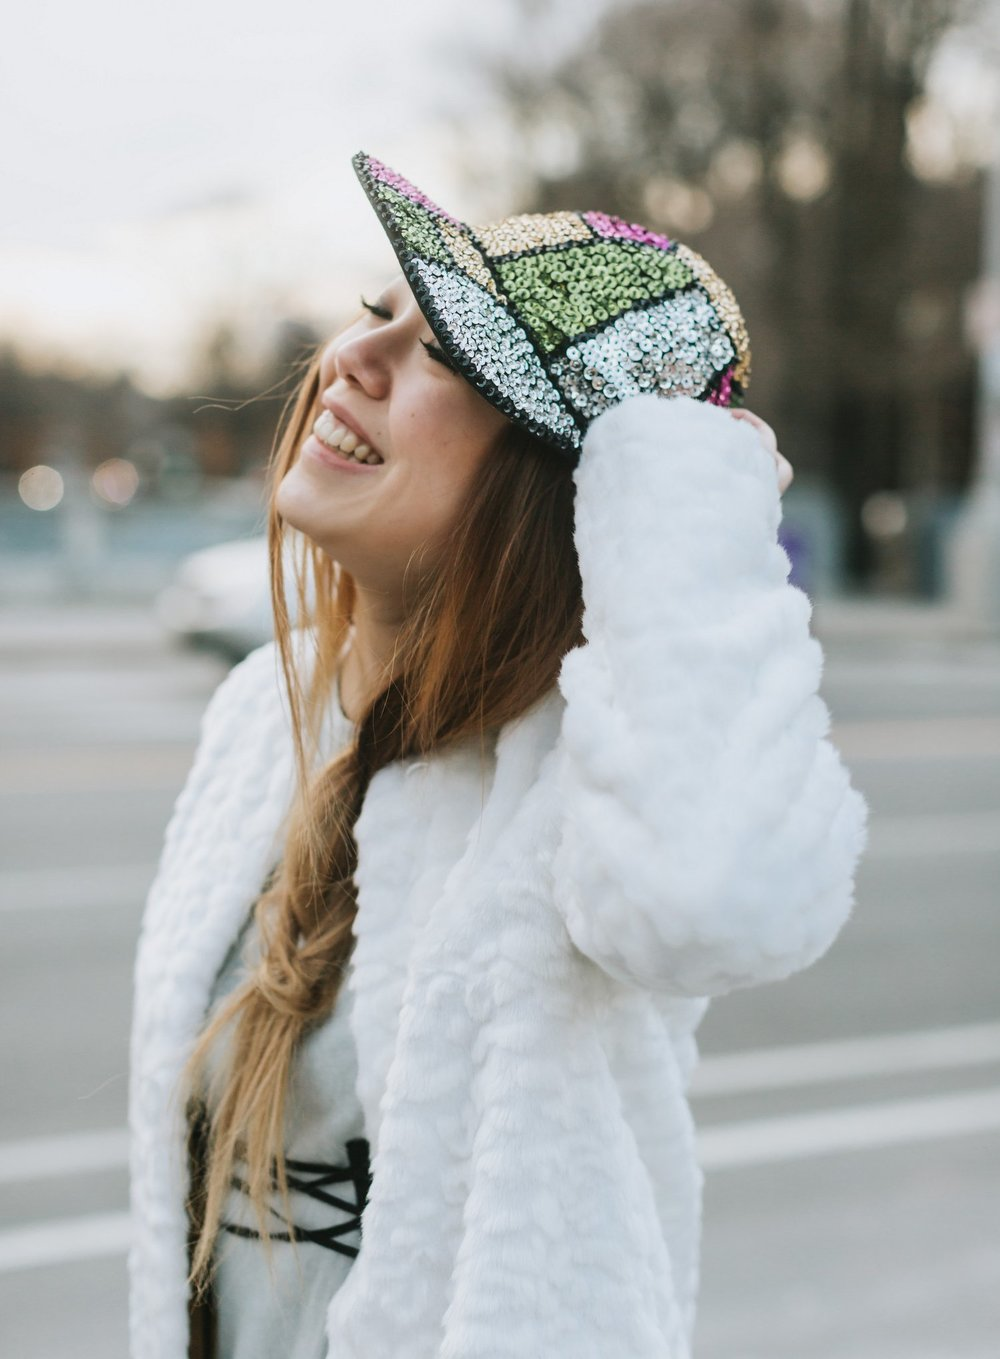 Lena_Mirisola_Urban_Outfitters-5.jpg